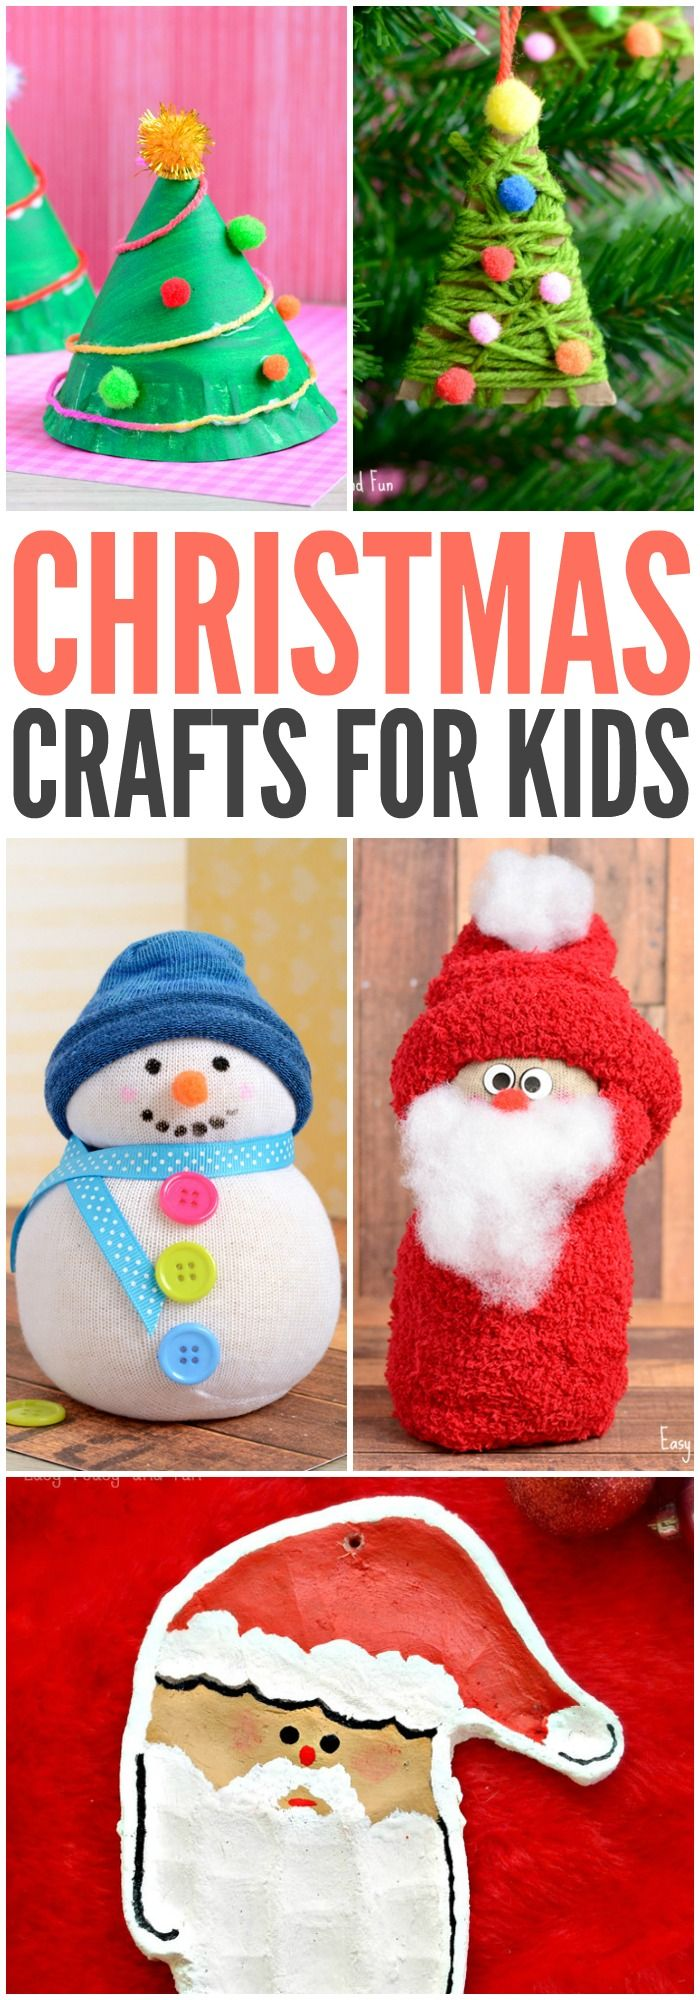 Christmas Crafts for Kids to Make